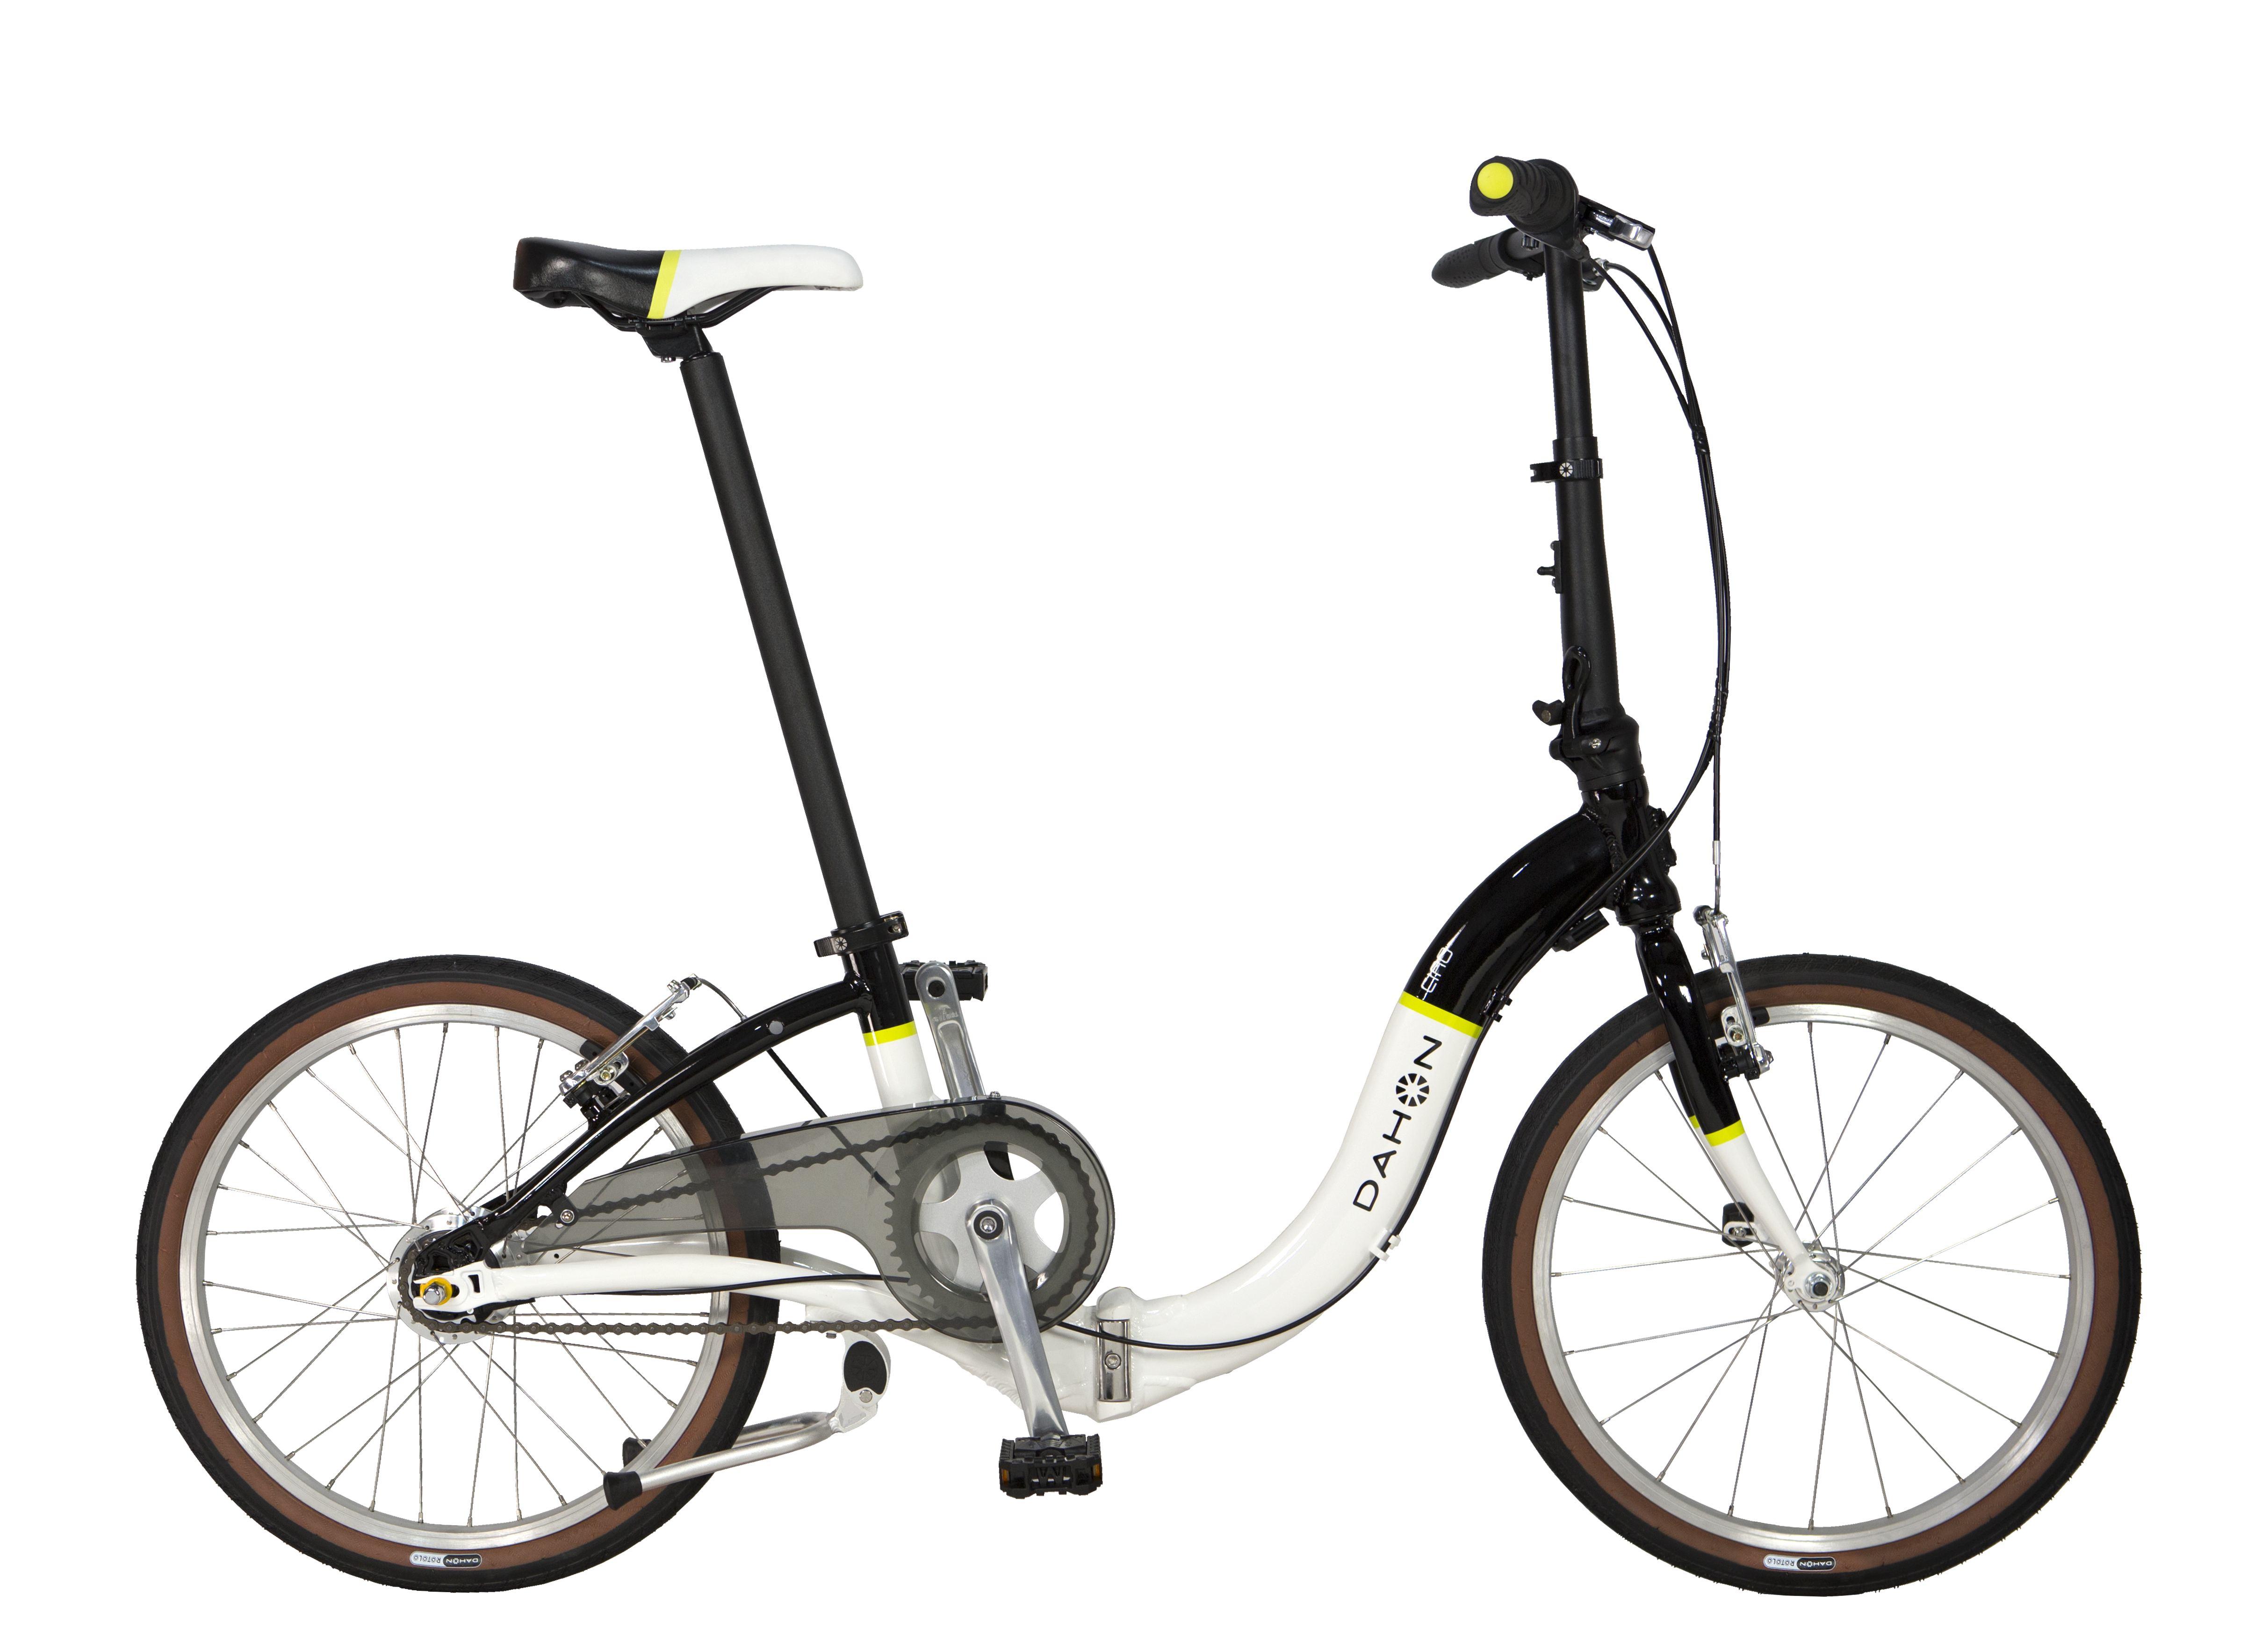 New 2014 Models from Folding Bike Manufacturer Dahon